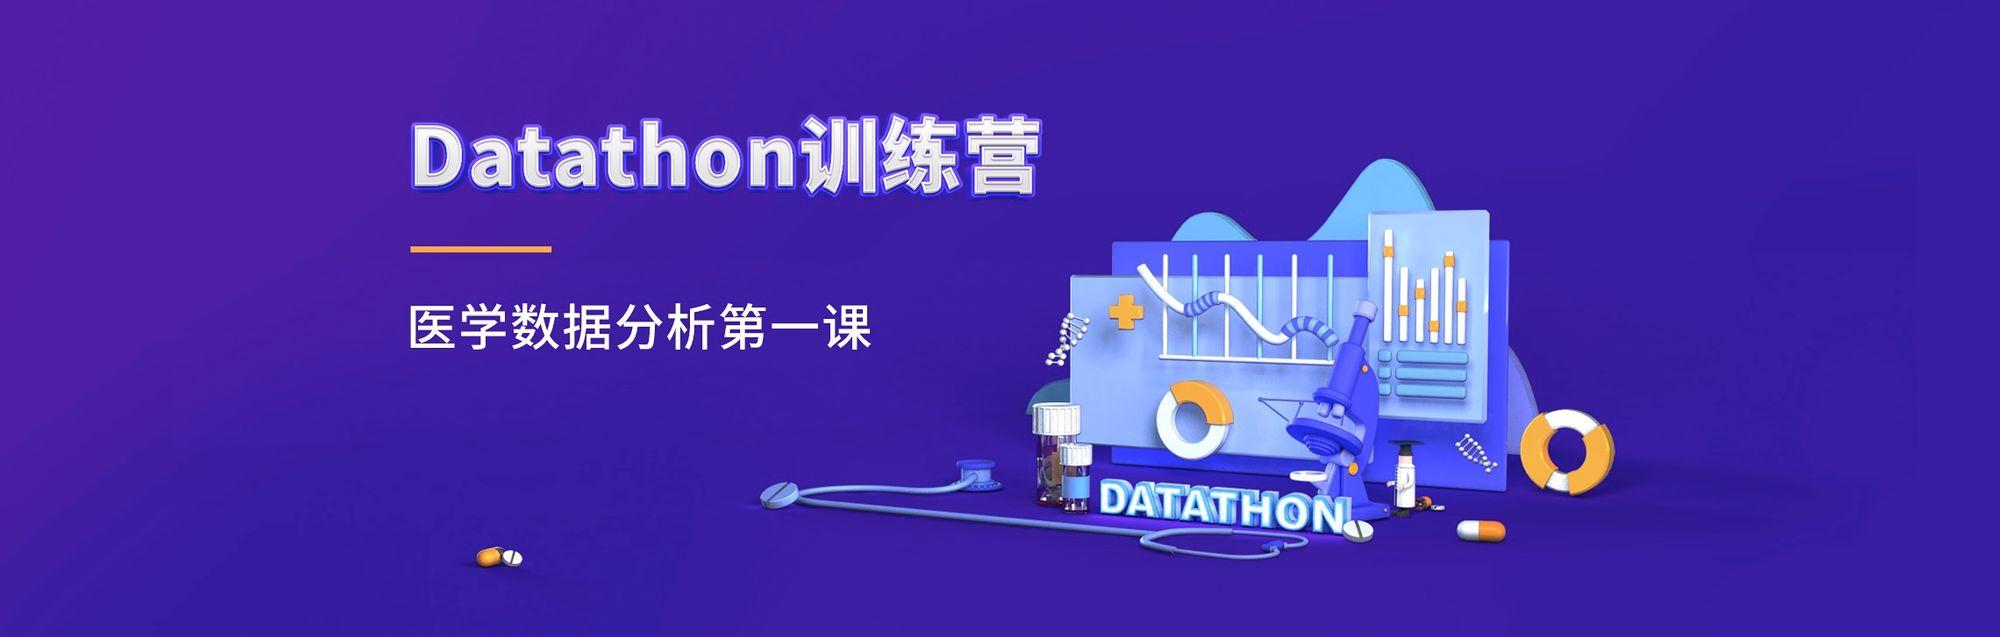 Datathon 训练营 | 一个能让你更了解医学领域数据分析的训练营